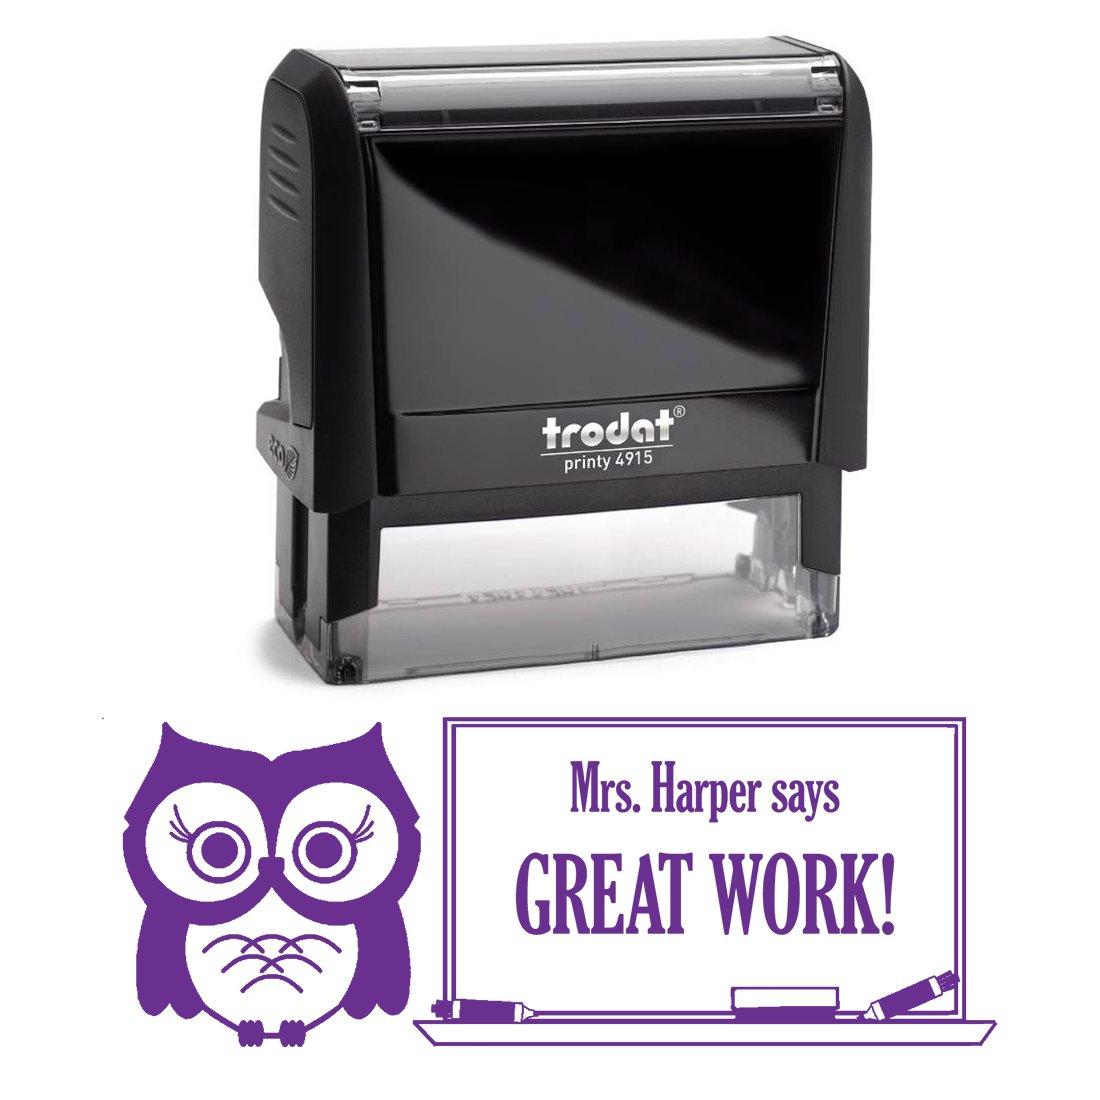 Purple Ink, Owl, Customizable Great Work Teacher Stamp, Self Inking, Homework Personalized School Work Stamp, Customized Unique Gift, Personal Classroom Stamper